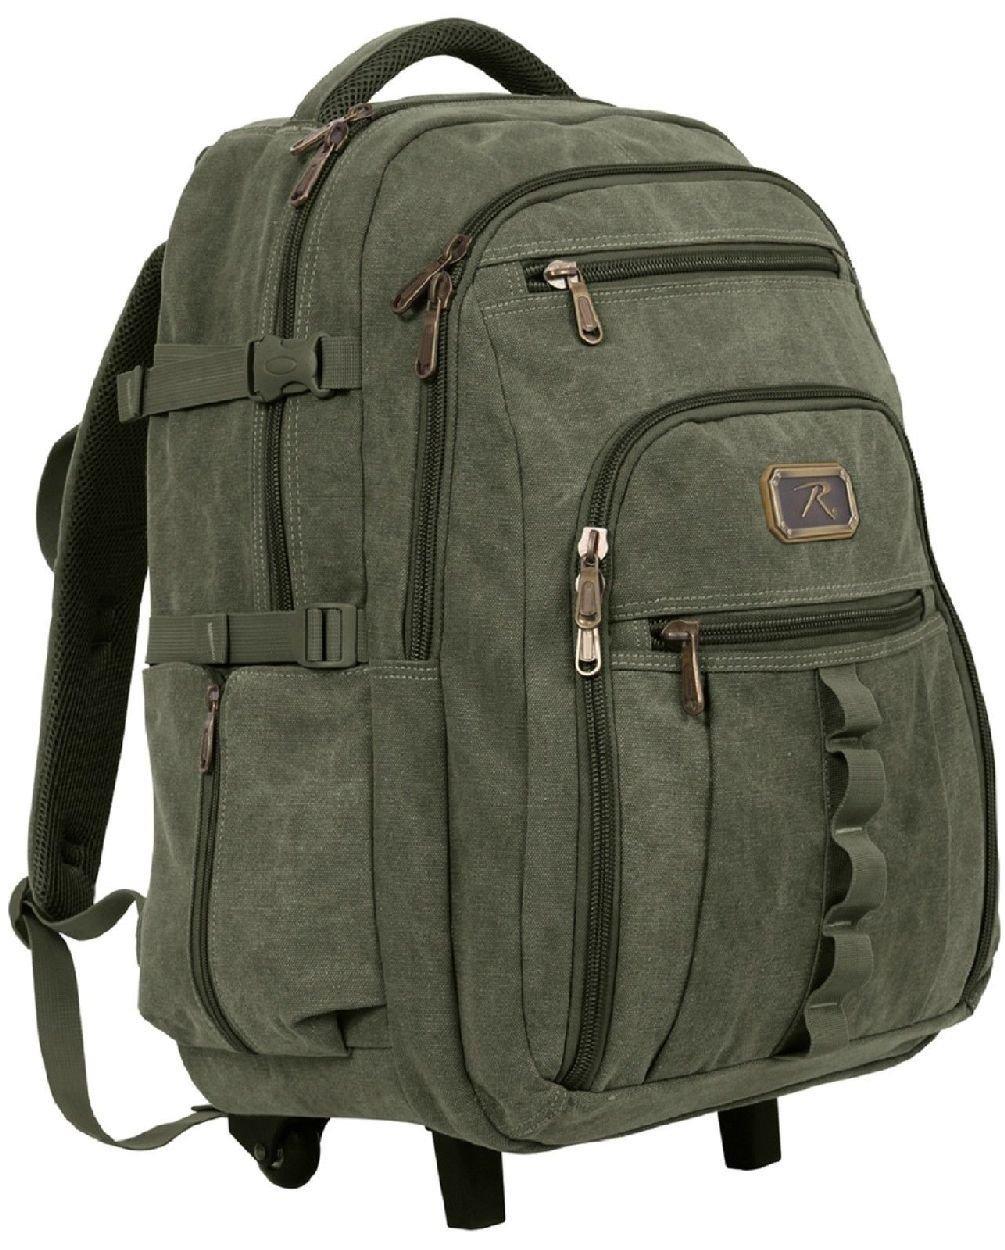 Rolling Canvas Backpack - Versatile 23'' Wheeled Bag W/ Push Handle